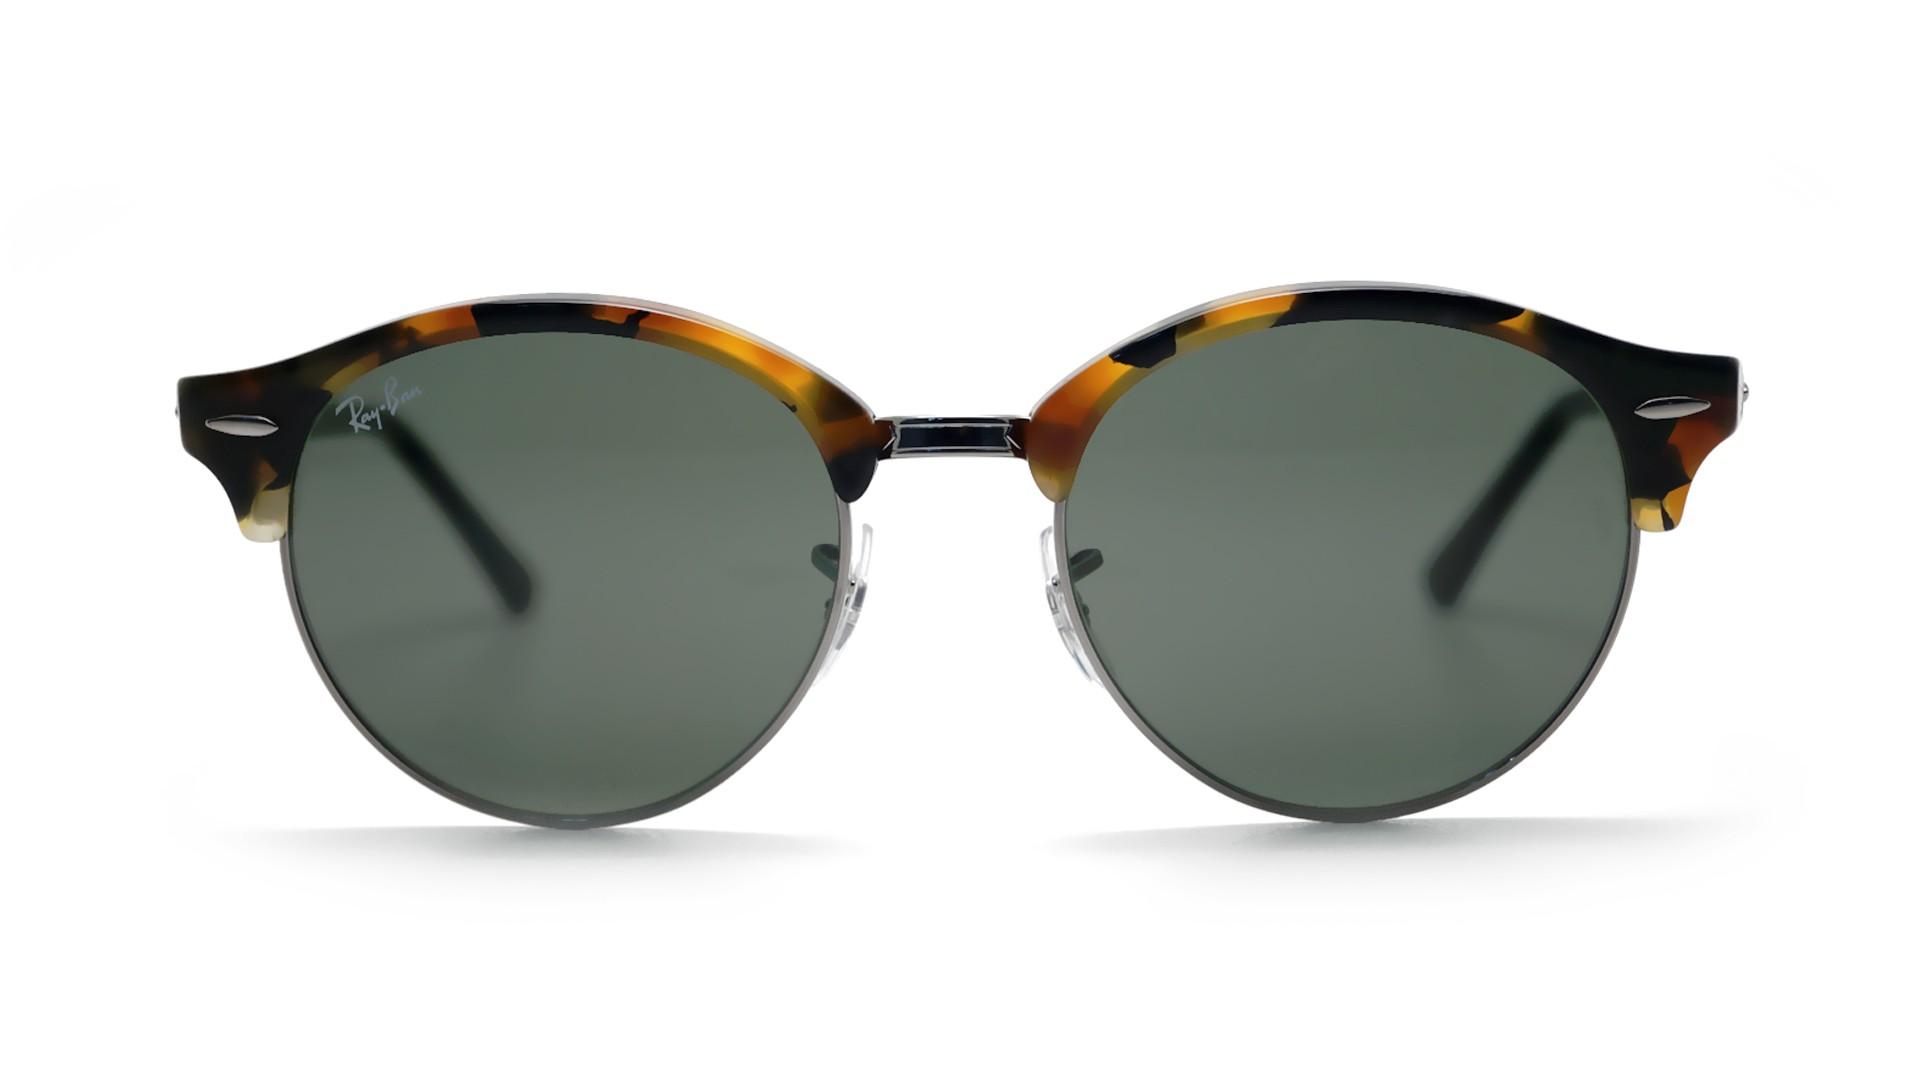 579c3ceb136c84 Sunglasses Ray-Ban Clubround Tortoise G15 RB4246 1157 51-19 Medium